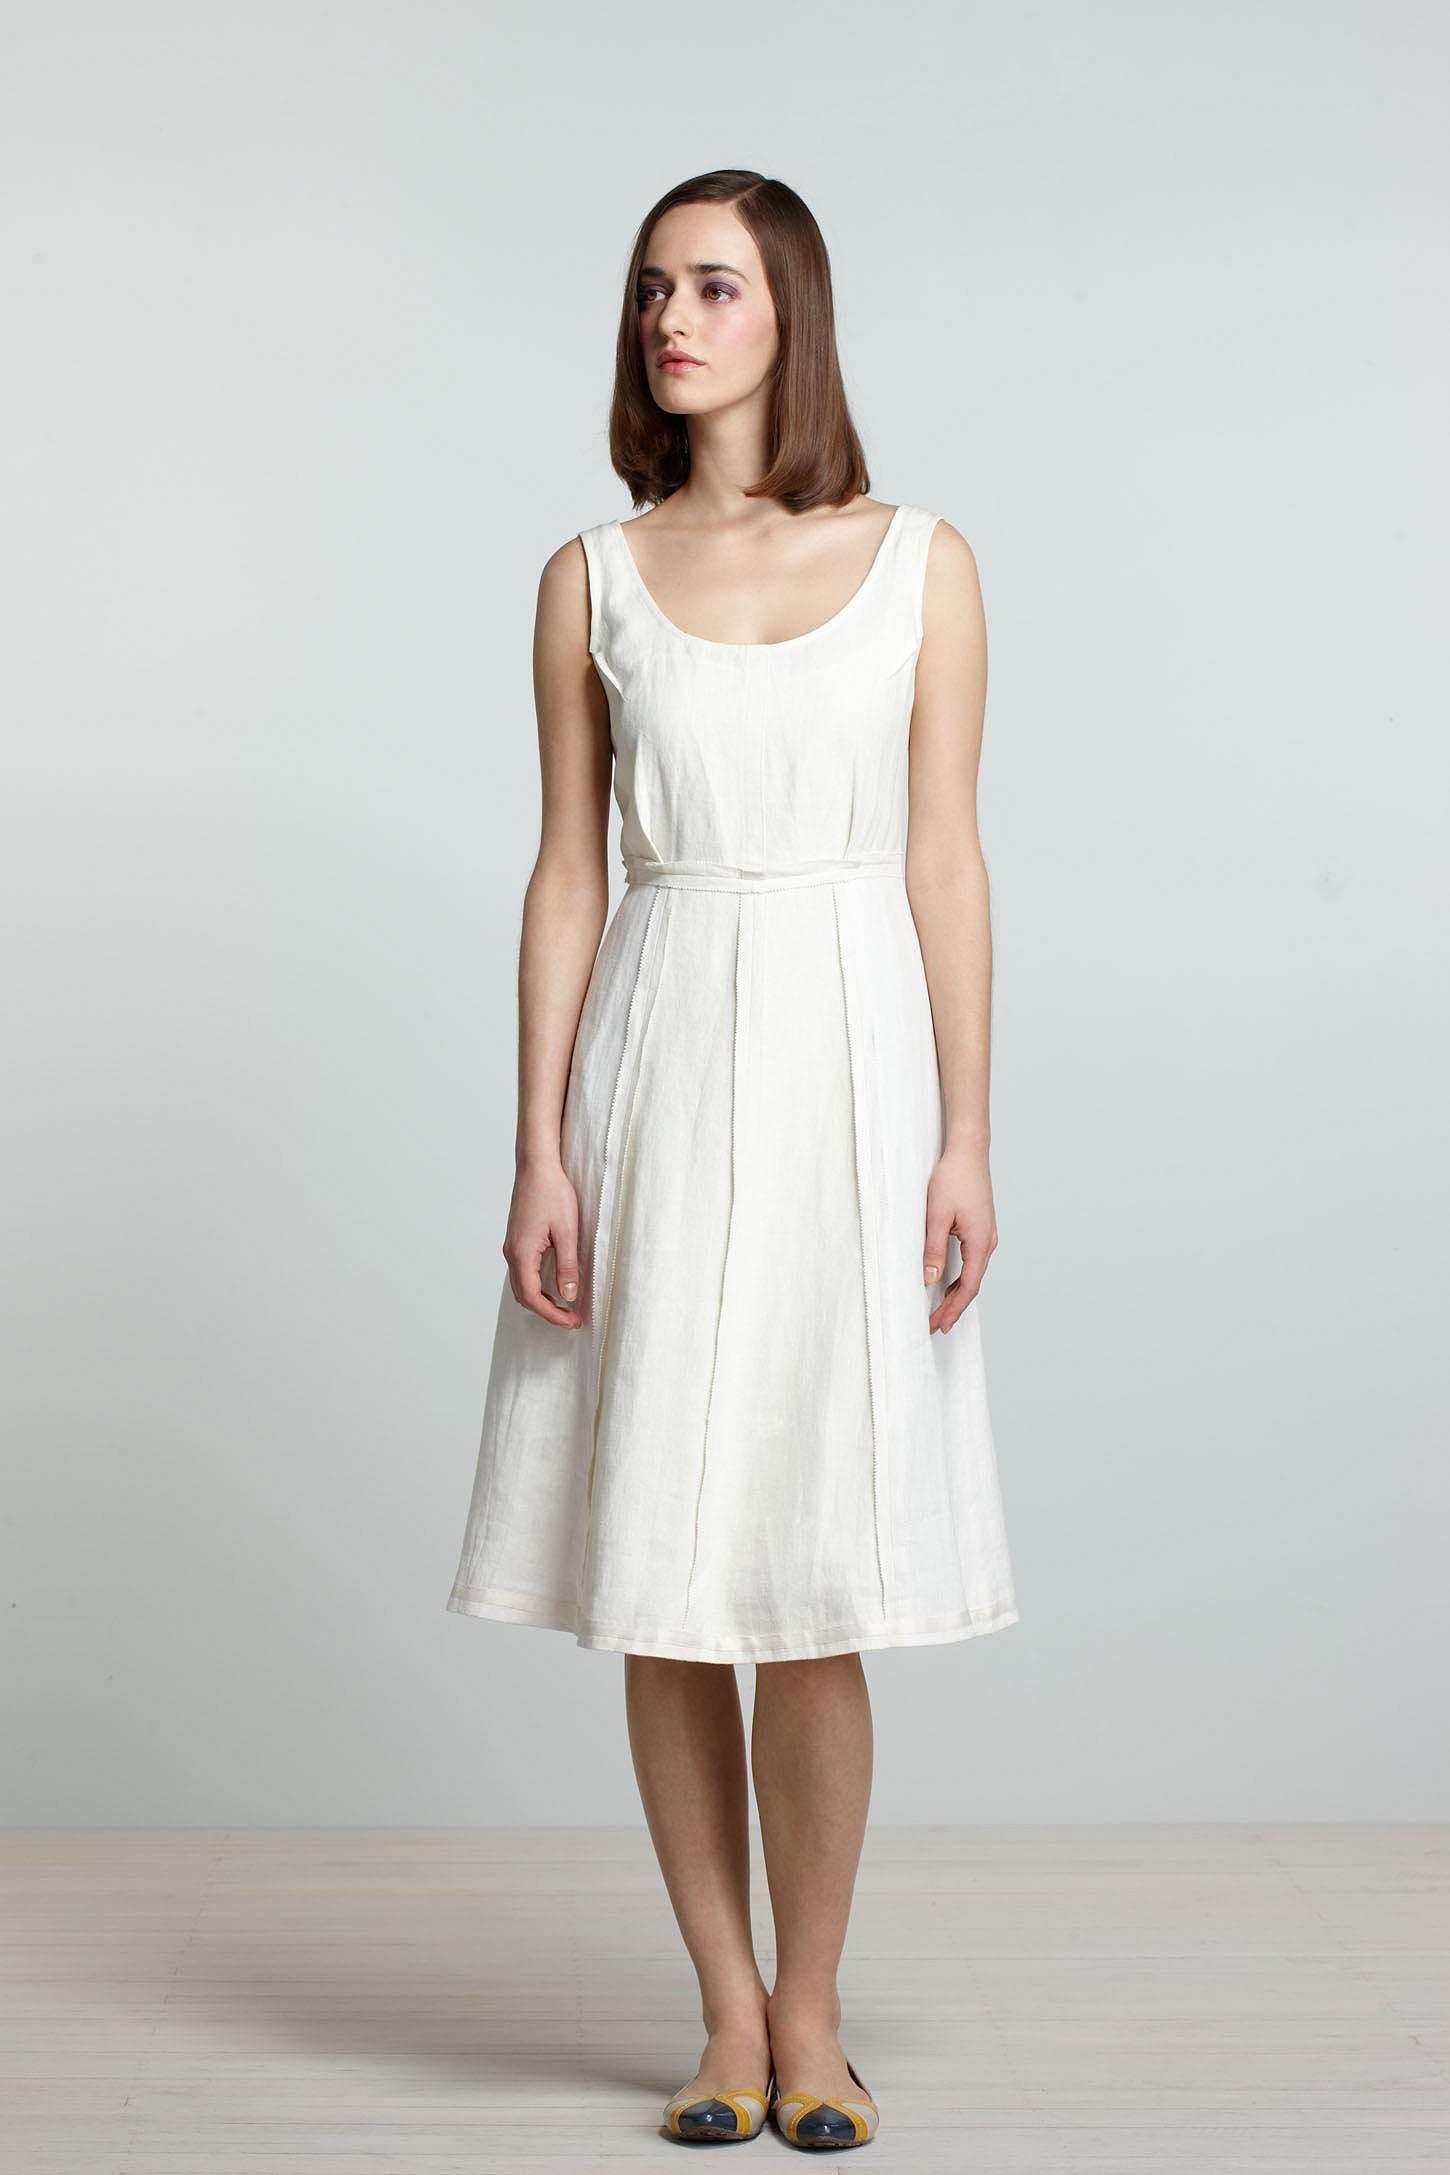 Annike Sleeveless Dress by Koto Bolofo